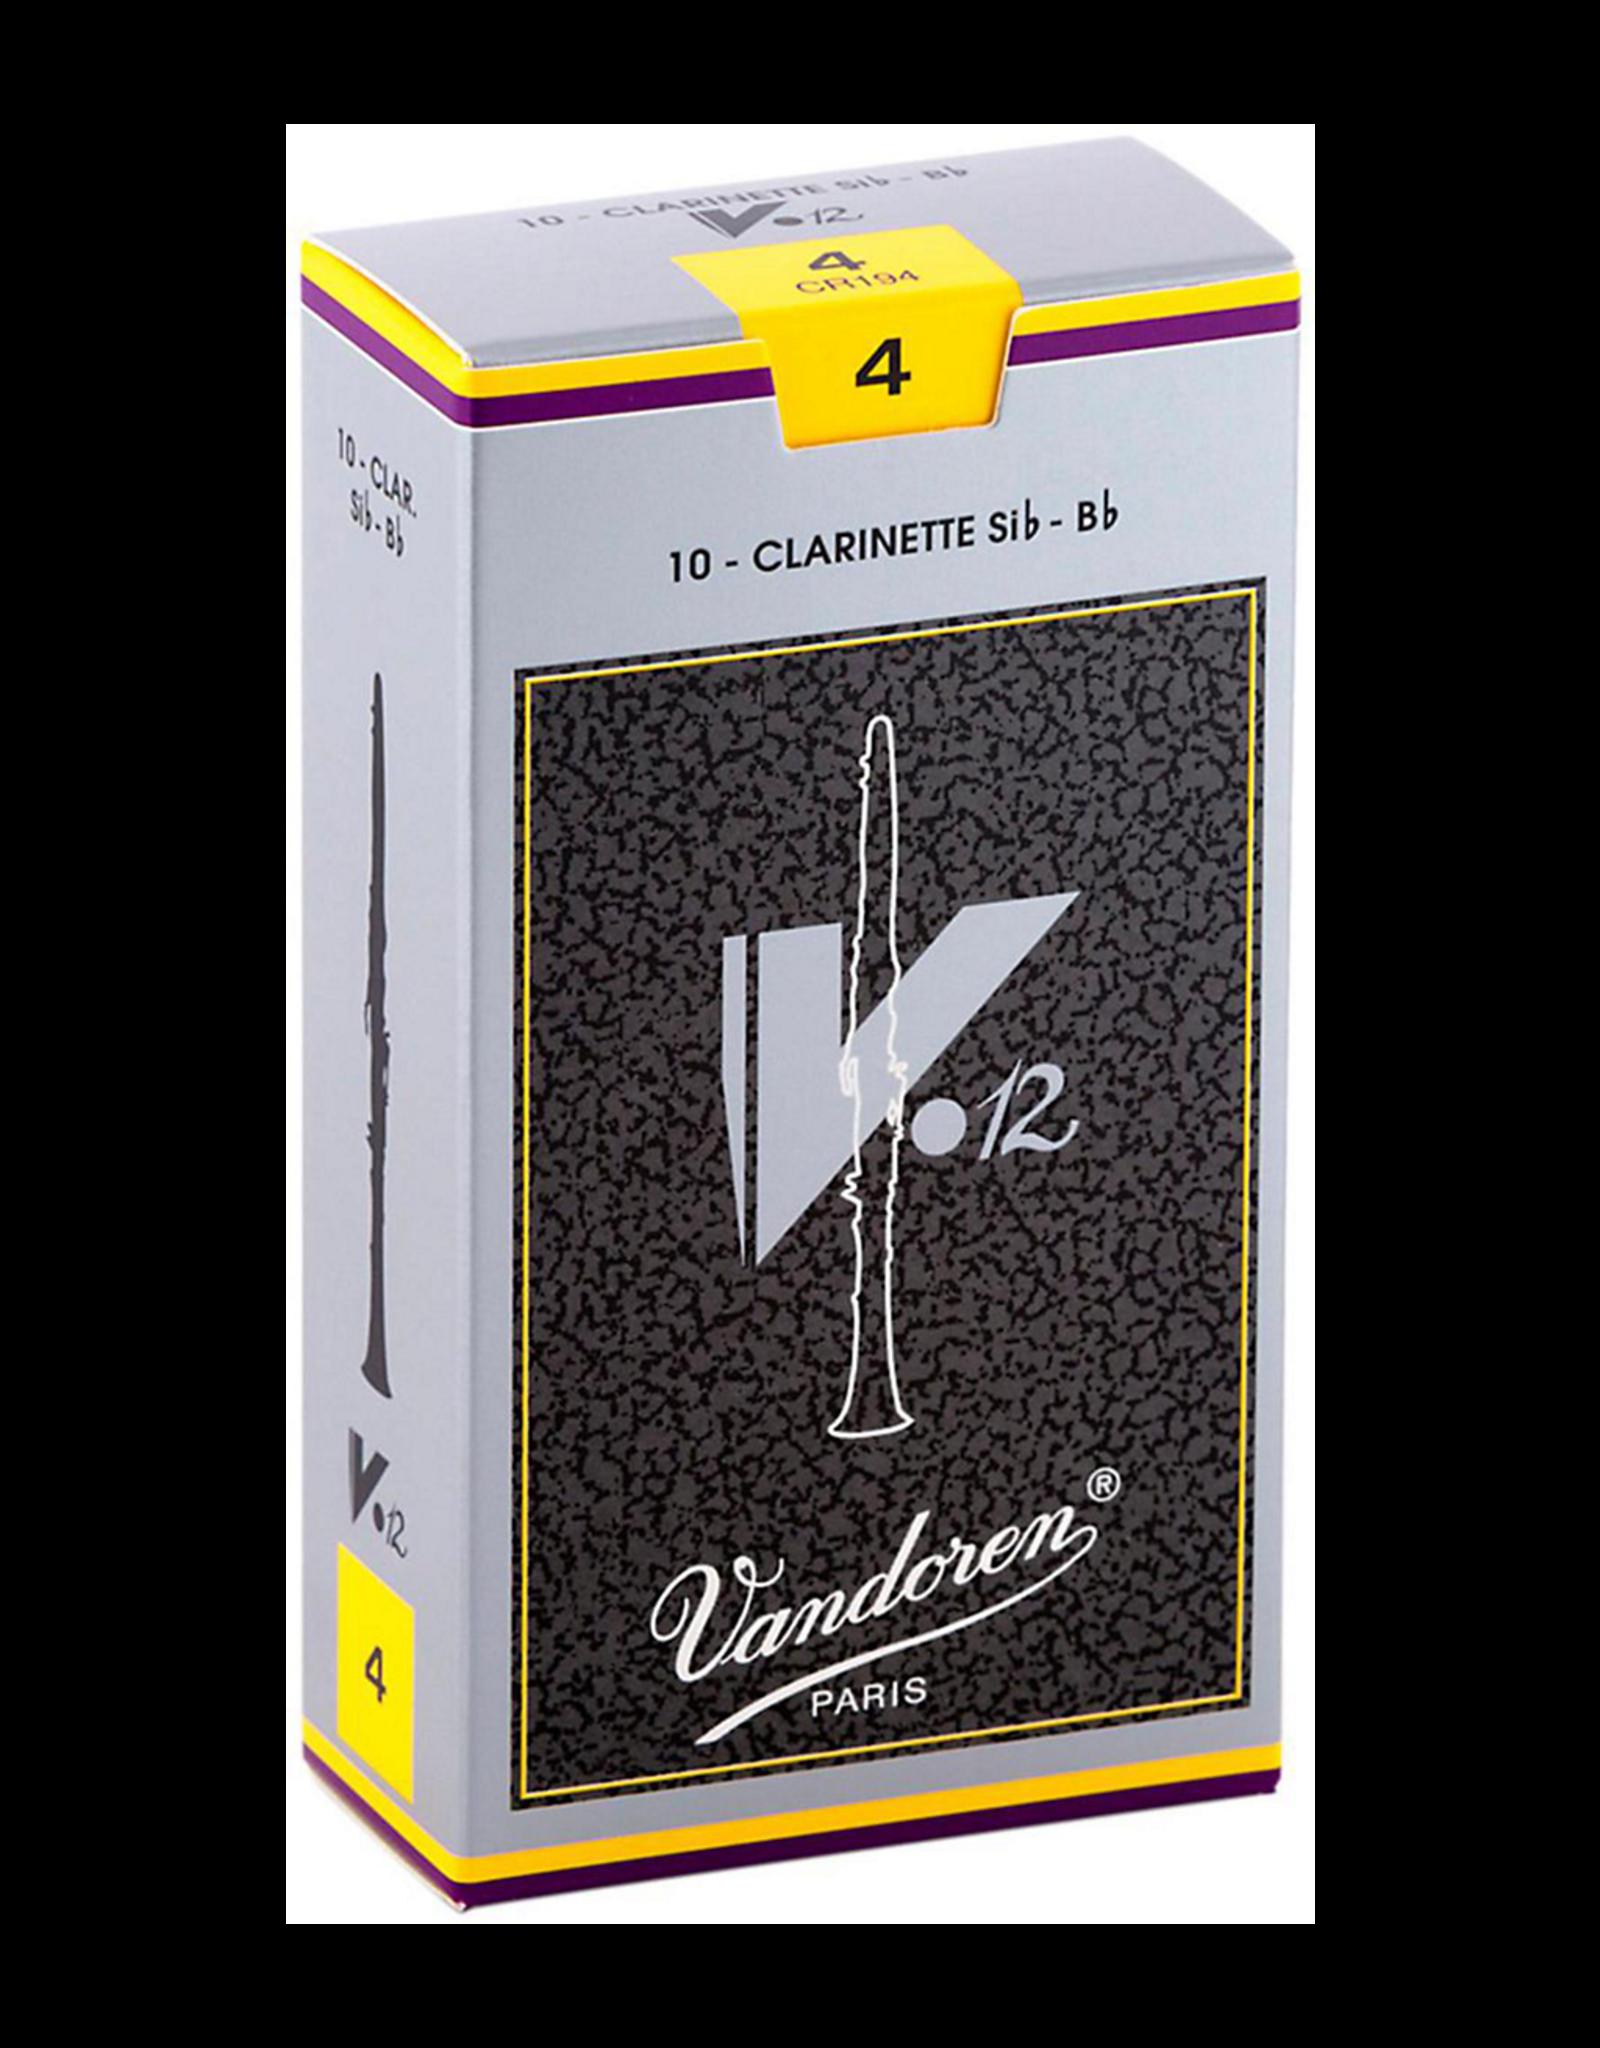 Vandoren Vandoren V.12 Bb Clarinet Reeds Box of 10;